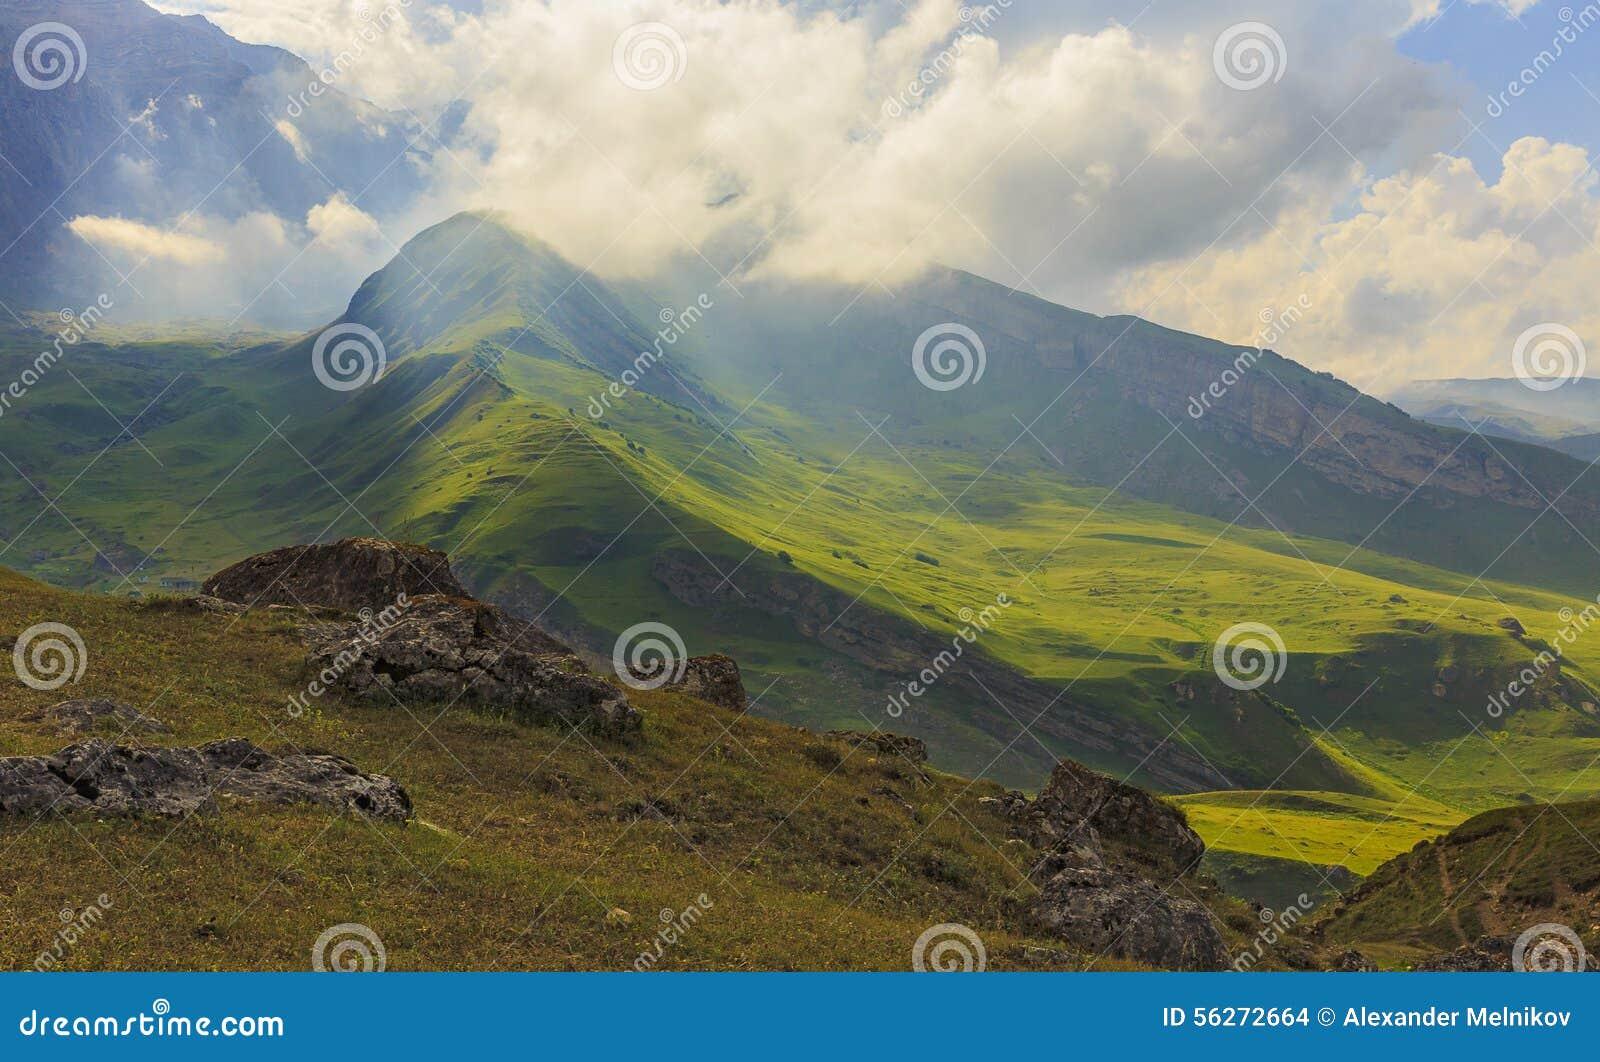 Parque nacional Shahdag (Azerbaijan) de las montañas